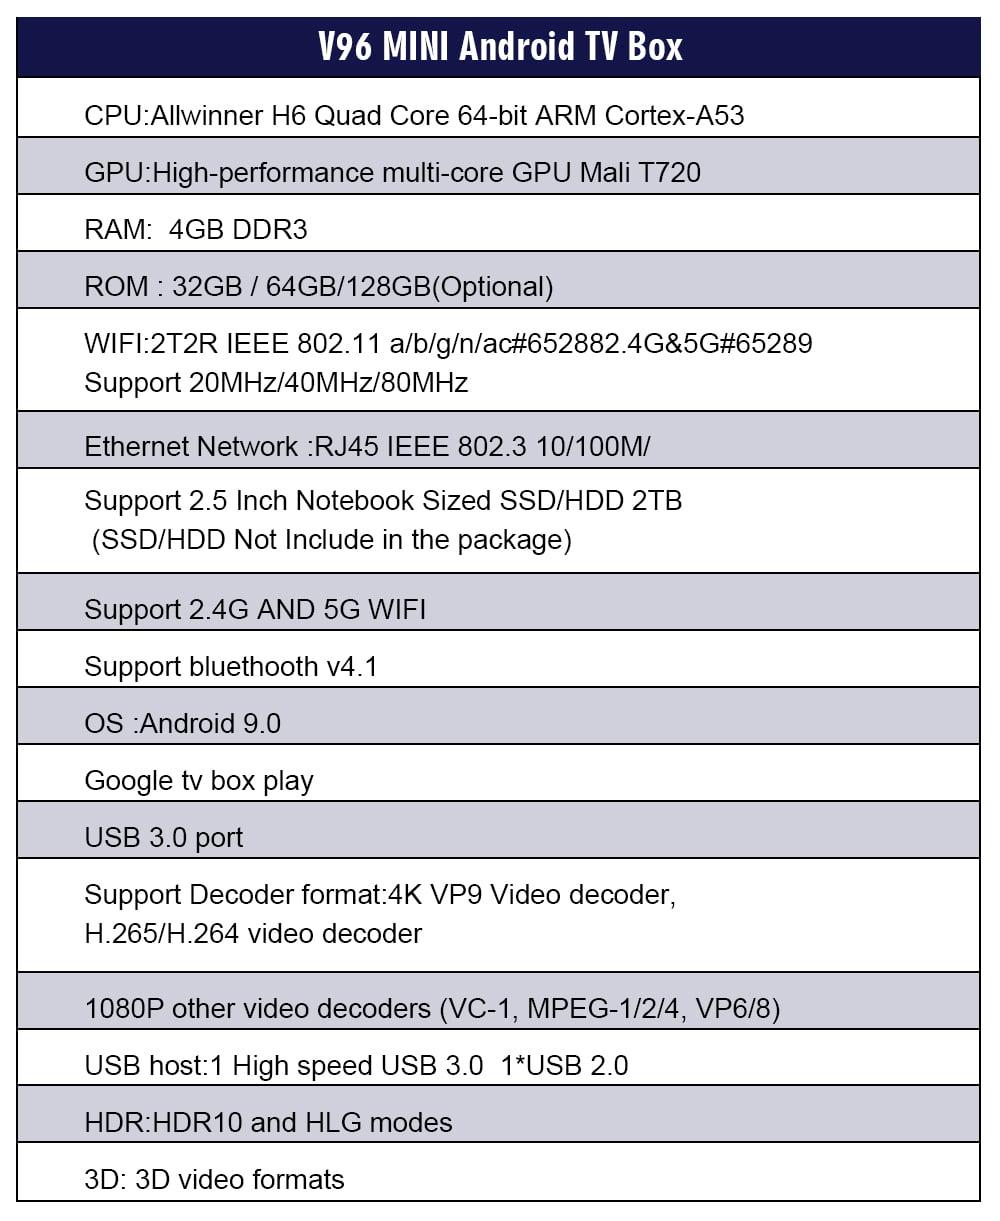 v96 mini allwinner h6 android 9.0 tv box 6k